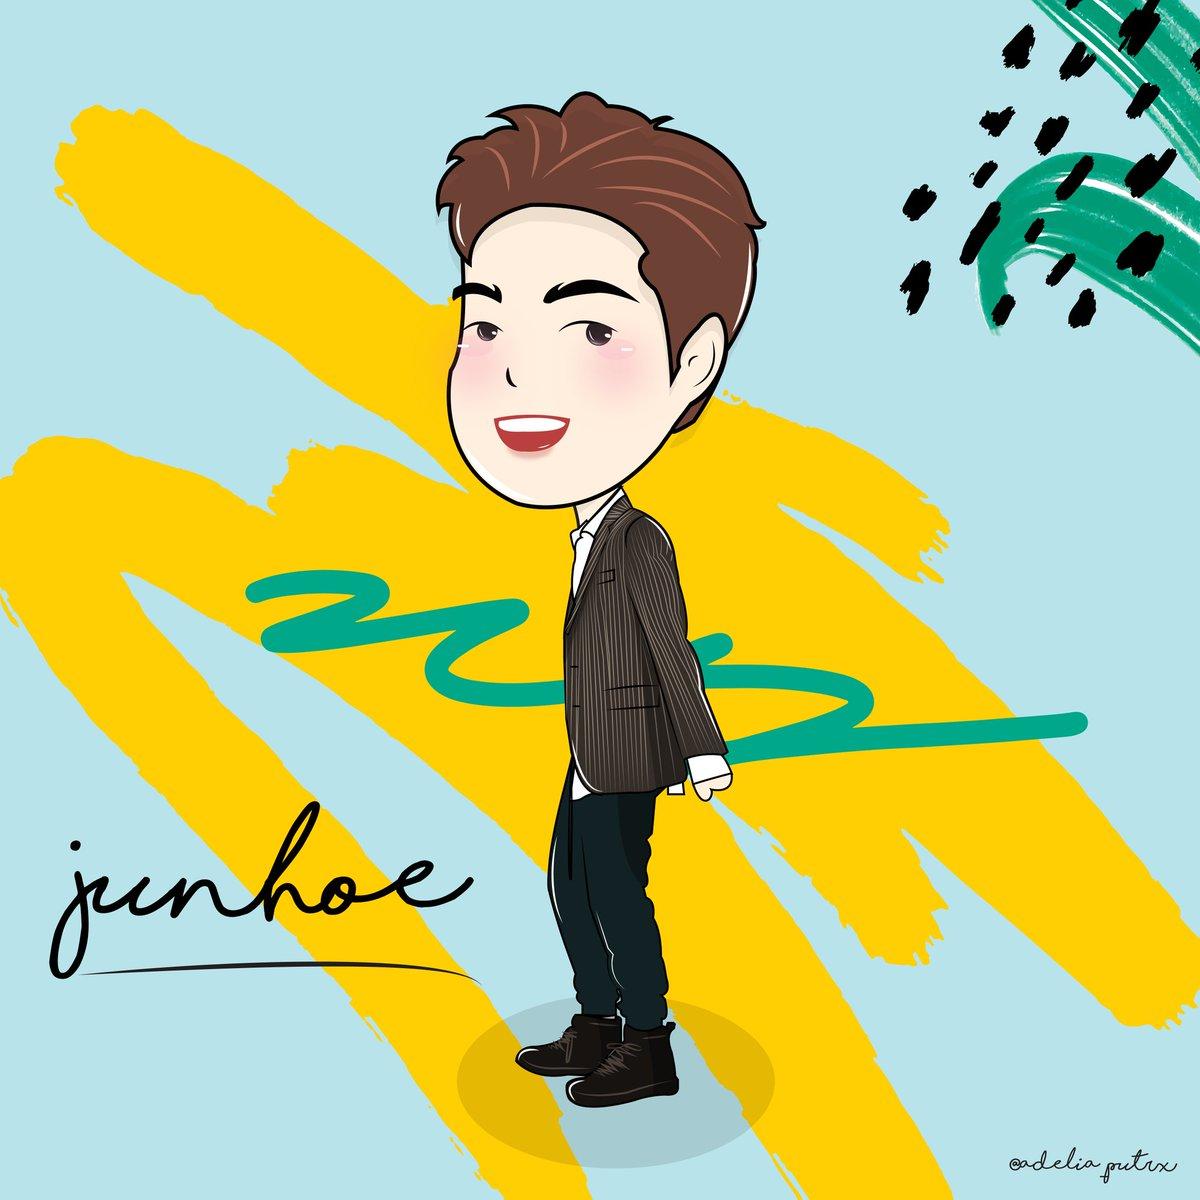 June fanart . . Request order @nrvnpntr  #chibi #fanart #cute #ikon #june #fanartikon #fanartjune #kpop #design #ilustrasi #adobeillustrator #junhoe<br>http://pic.twitter.com/HNO0VKT7Pf